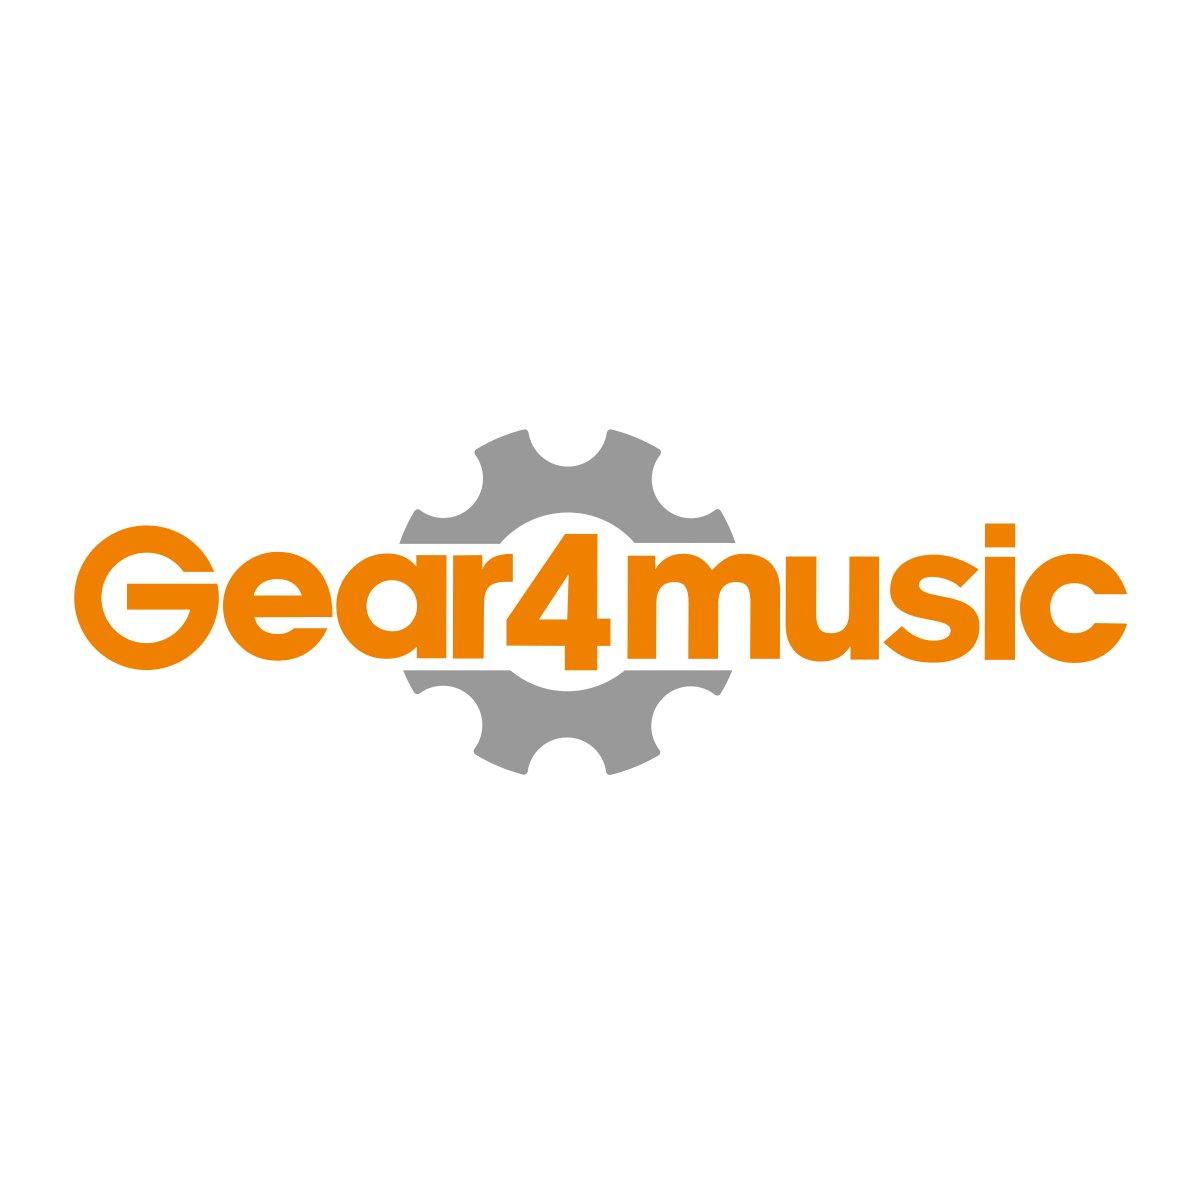 evans genera drum head 13 inch at gear4music. Black Bedroom Furniture Sets. Home Design Ideas